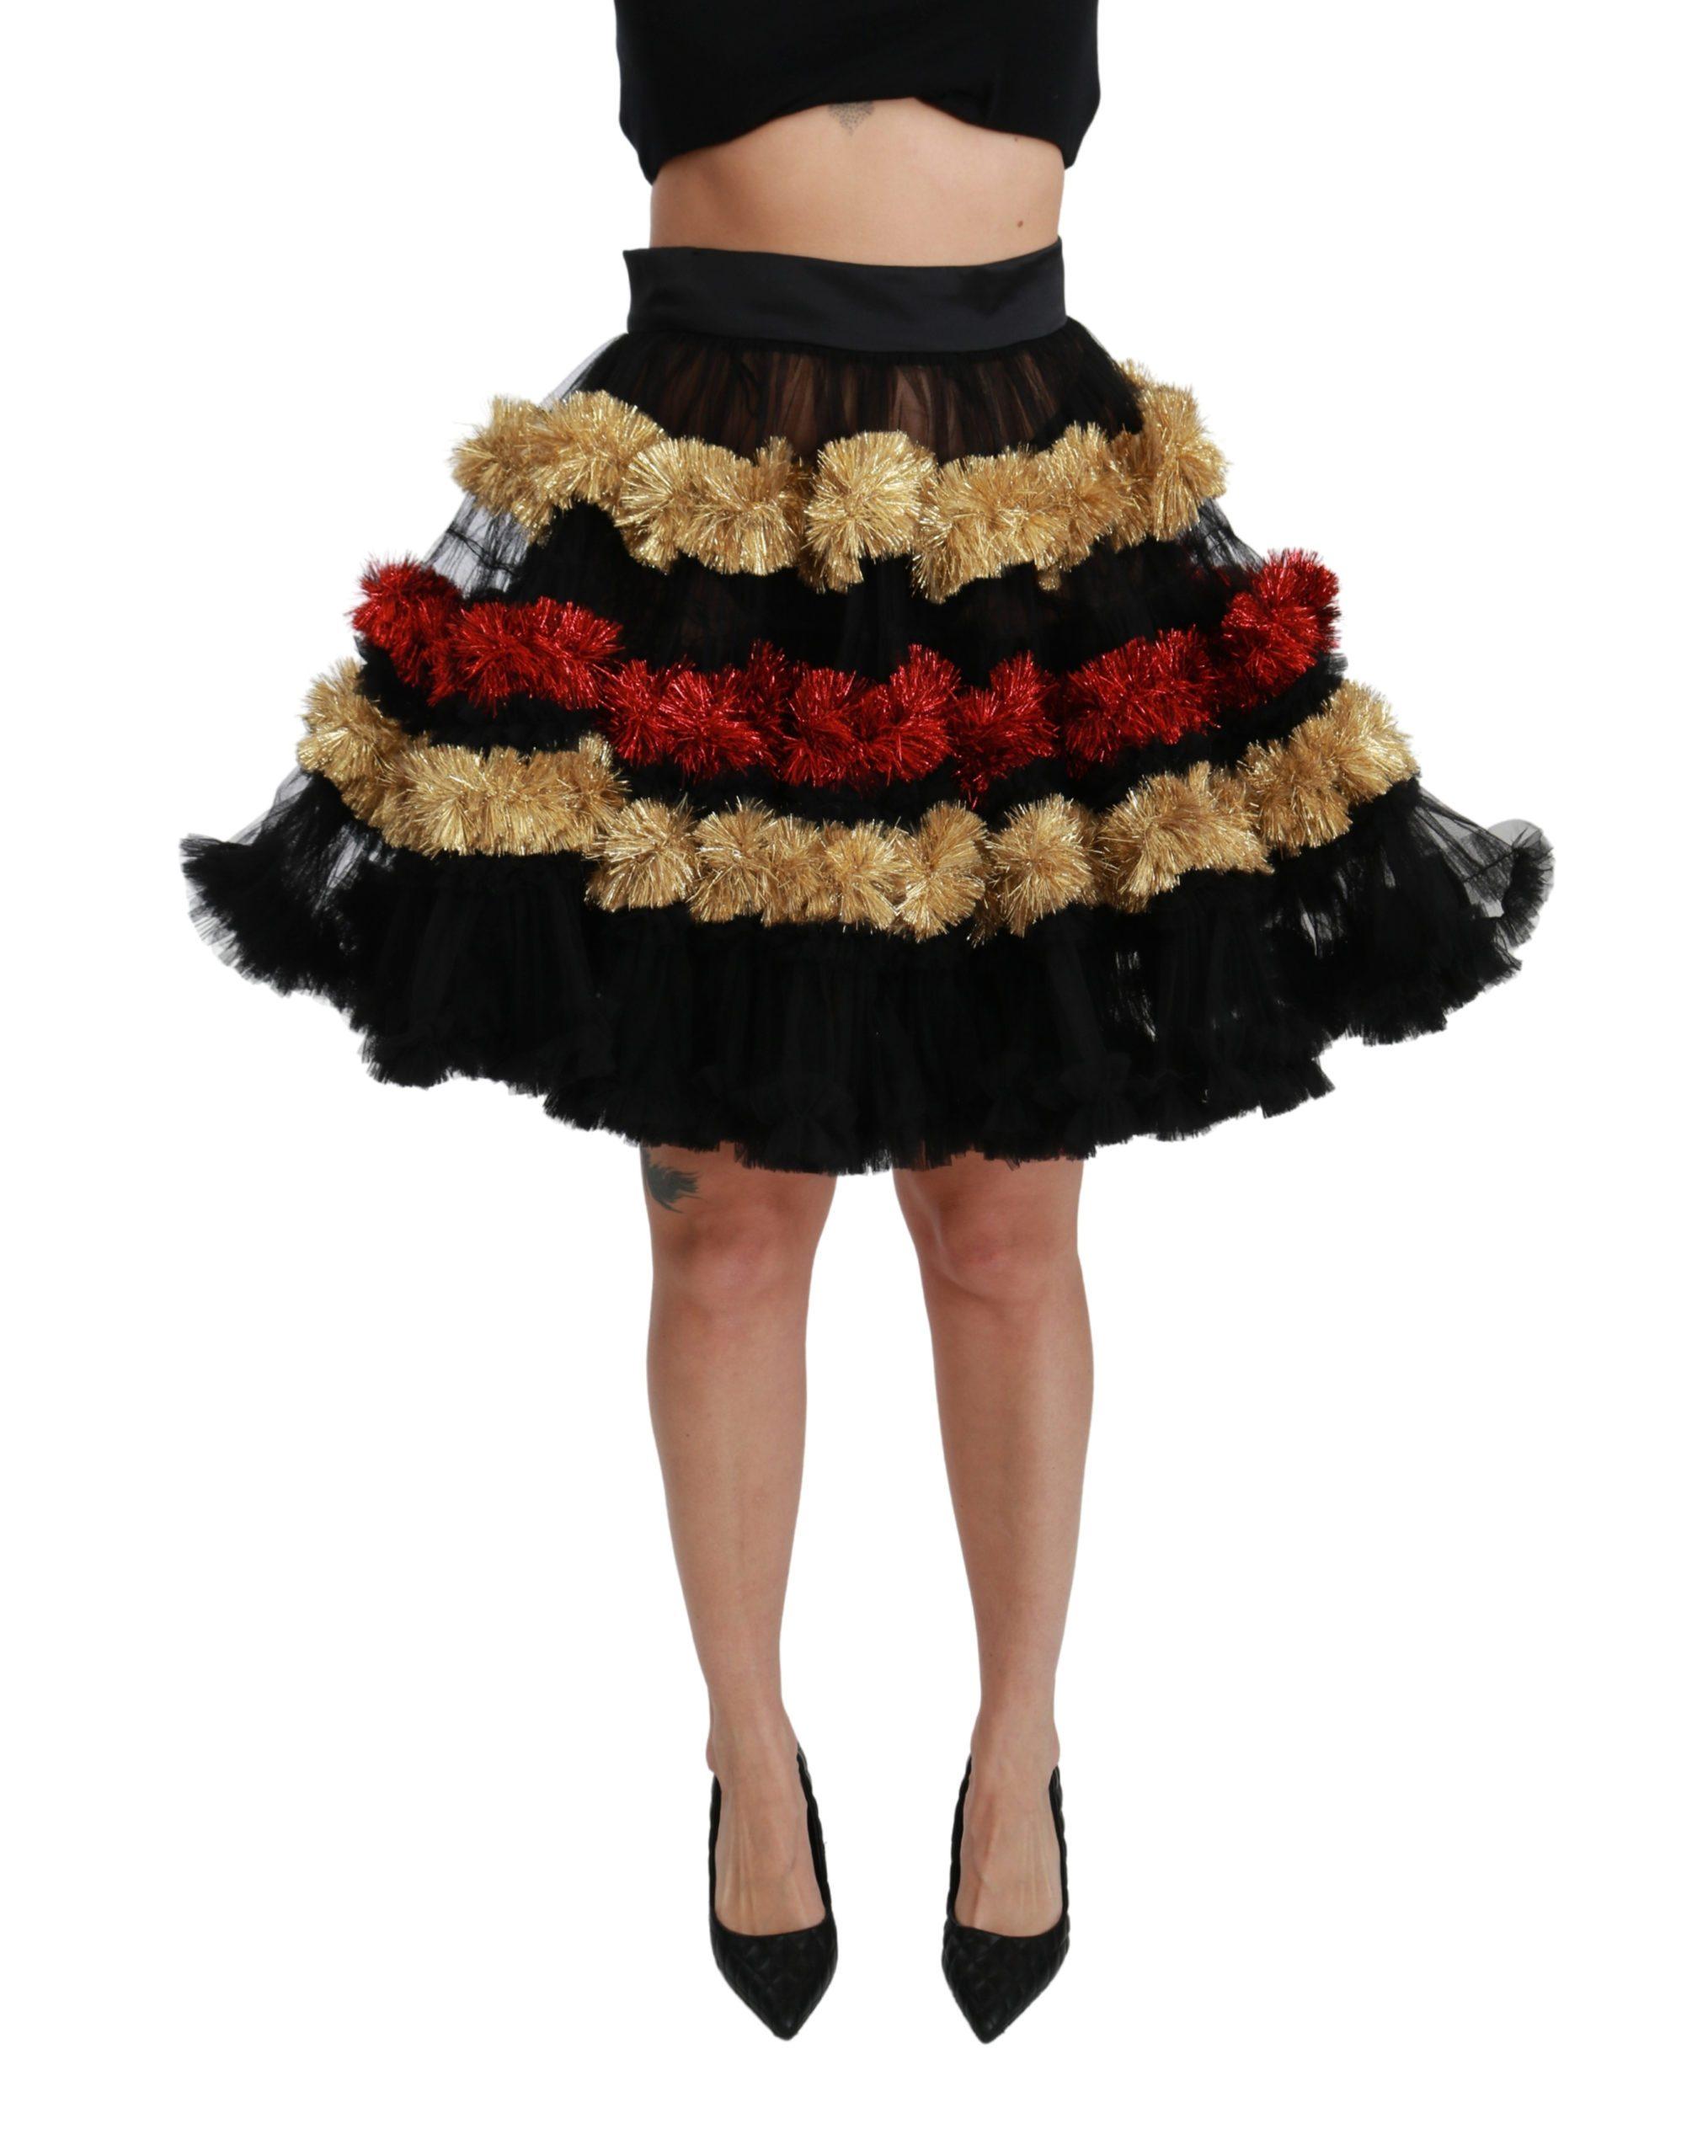 Dolce & Gabbana Women's Sheer Layered Ruffled Skirt Multicolor SKI1422 - IT40|S